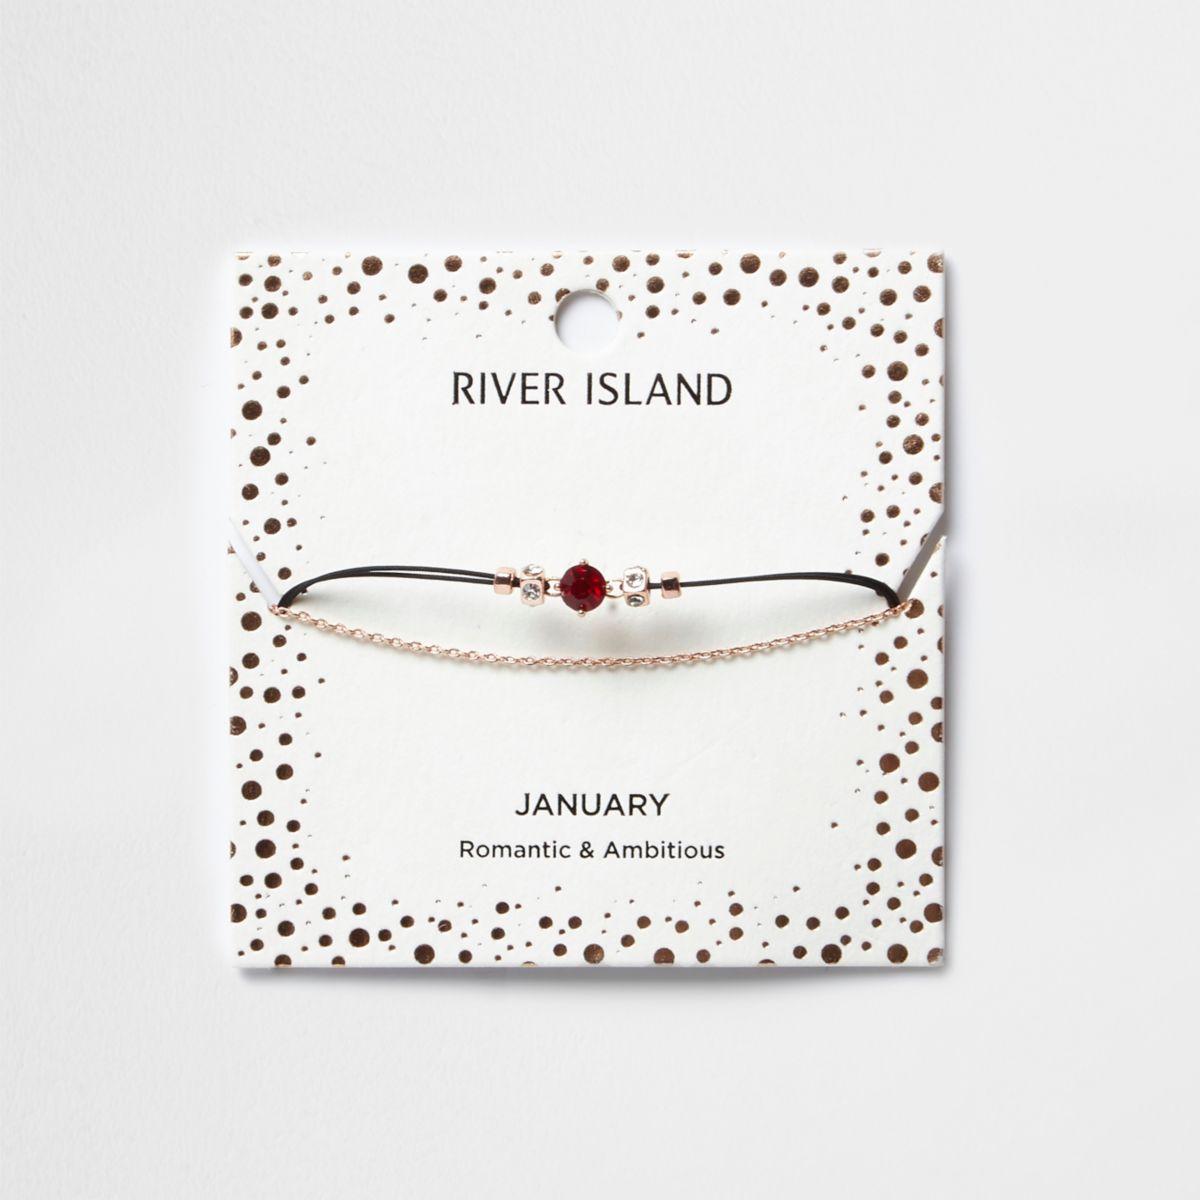 Red January birthstone chain bracelet